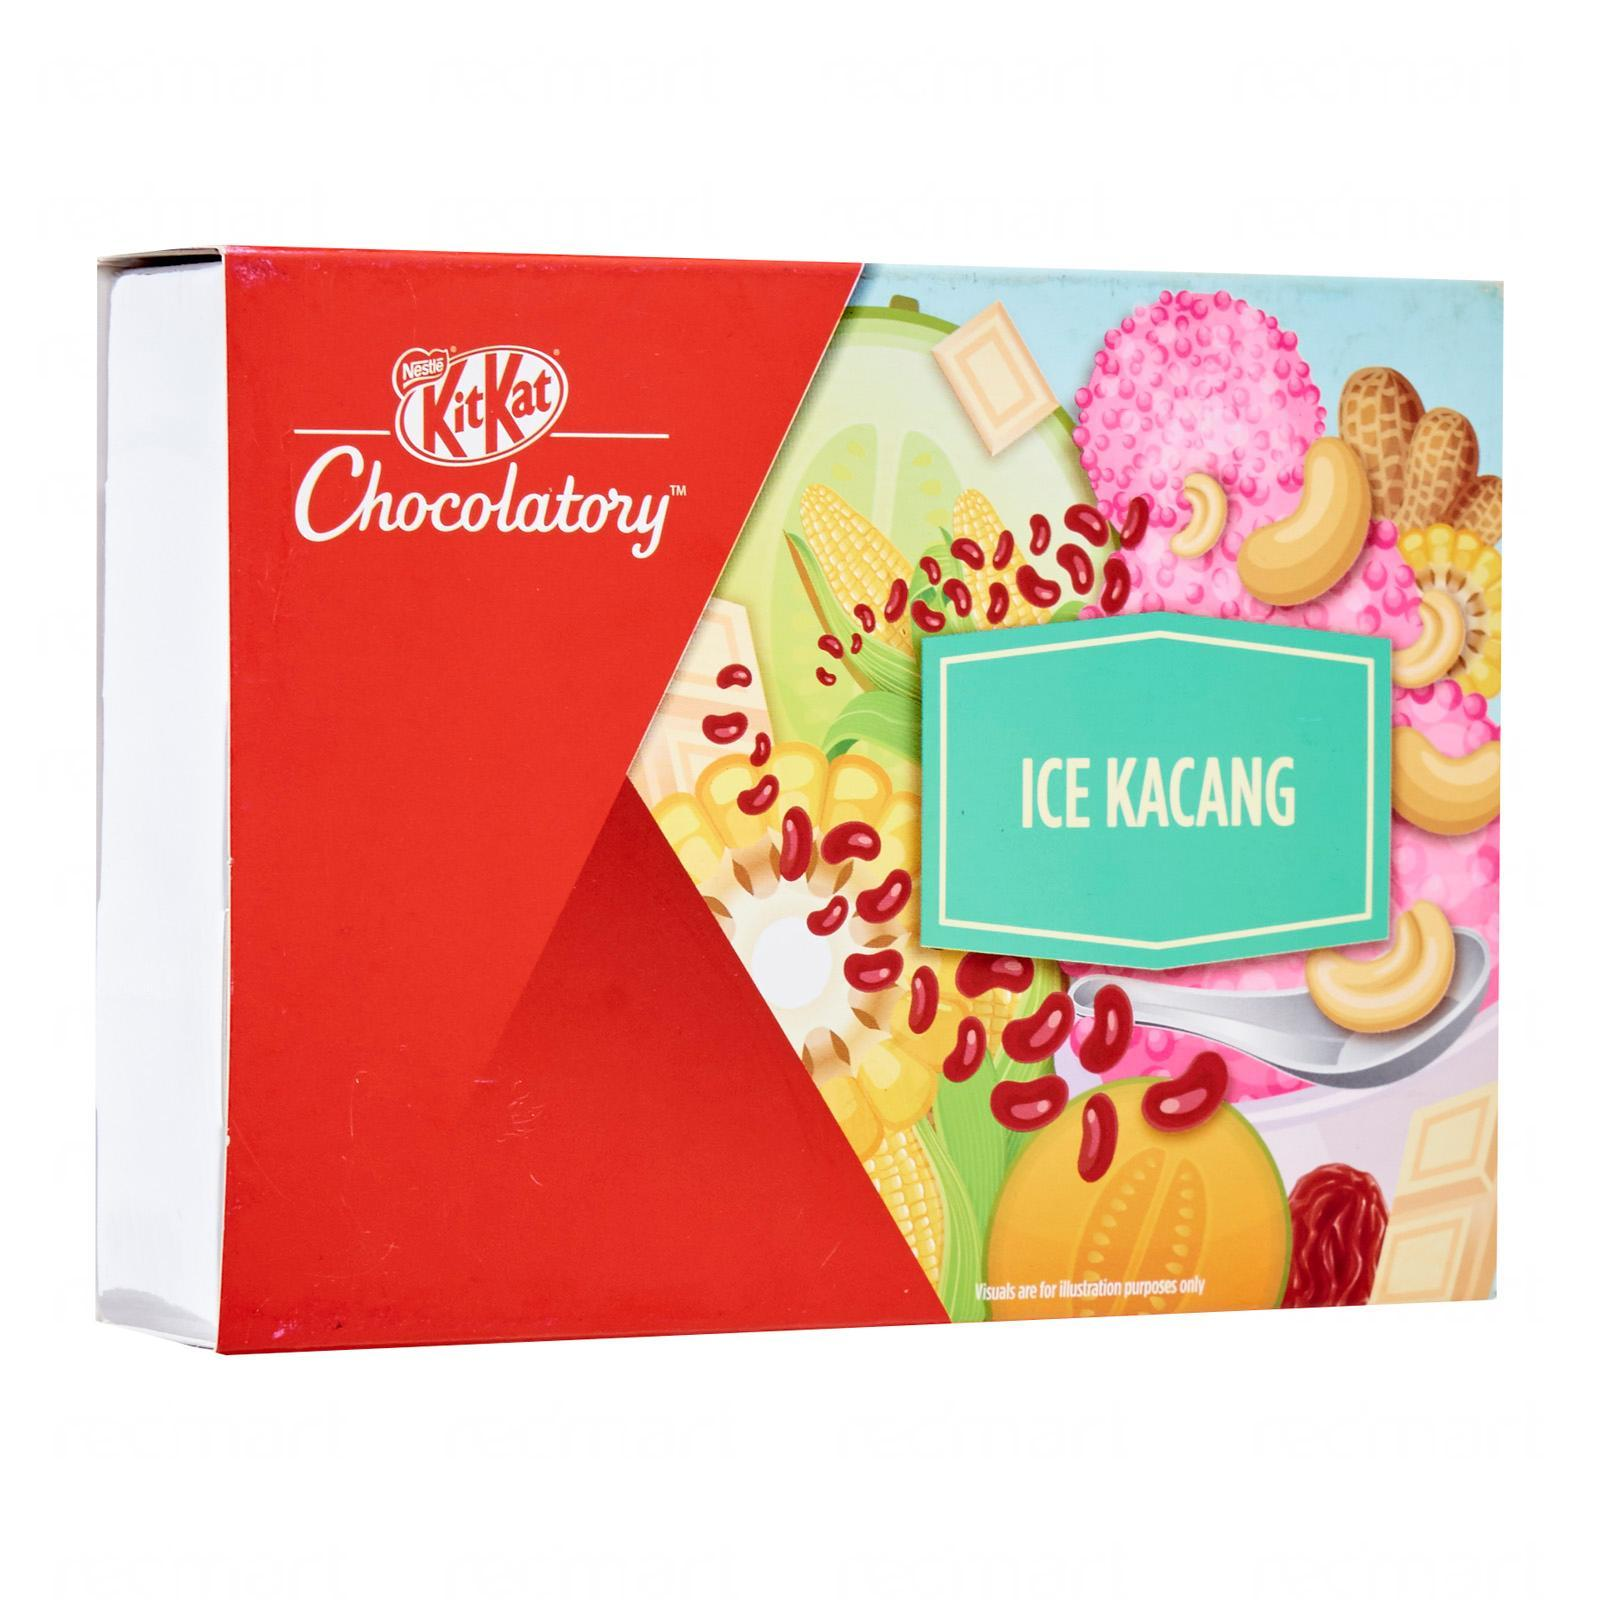 NESTLE KIT KAT Chocolatory Ice Kacang (Special Edition)